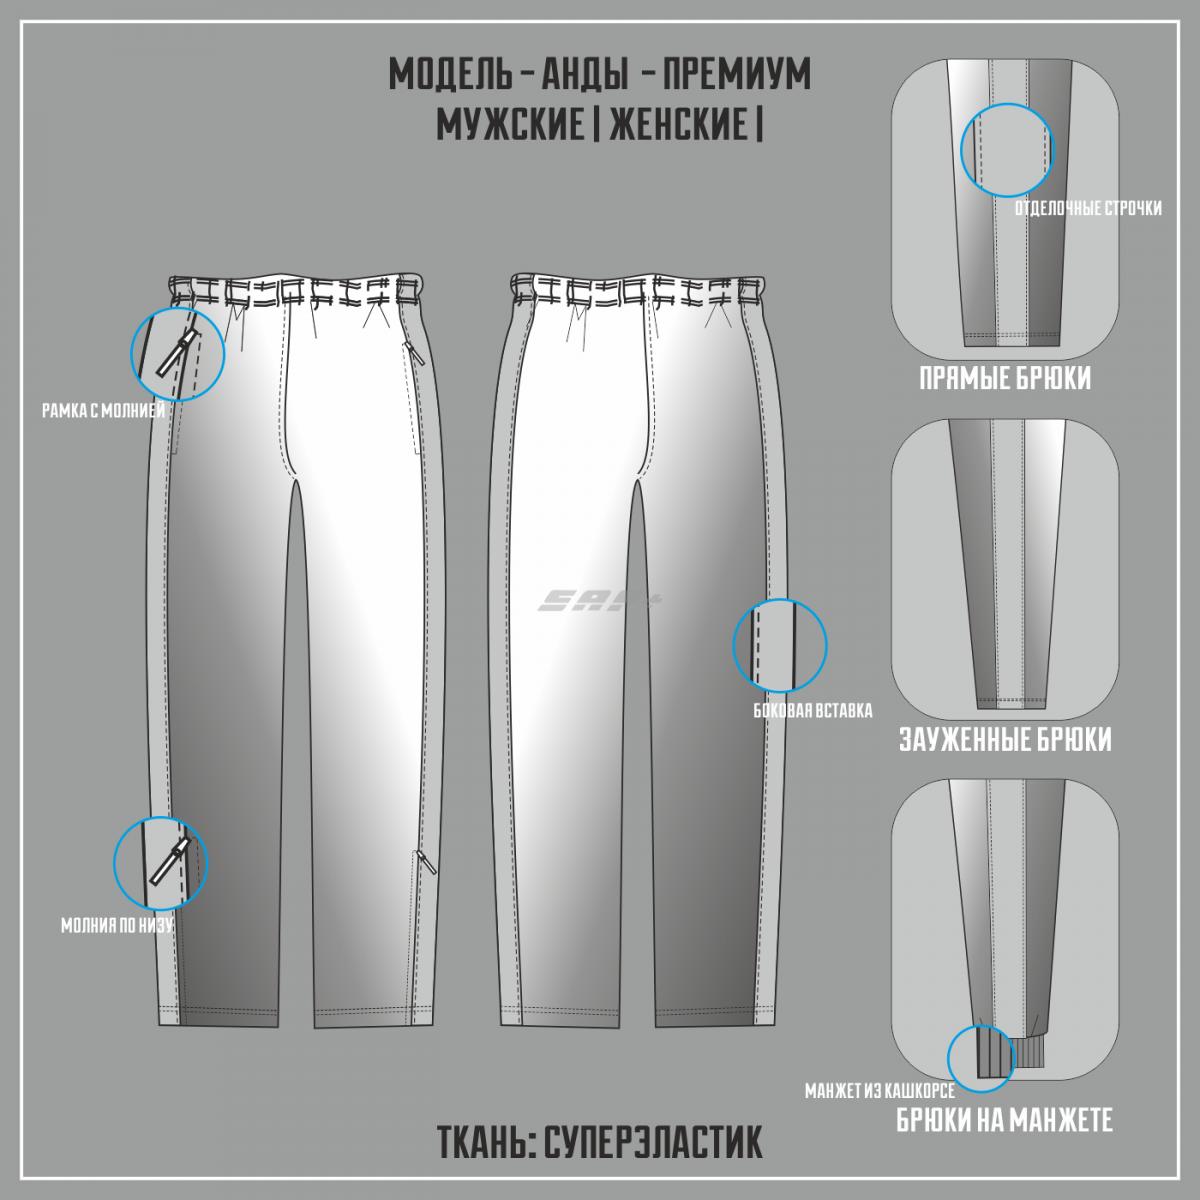 АНДЫ-СУПЕРЭЛАСТИК ПРЕМИУМ брюки (Сублимация лампаса)